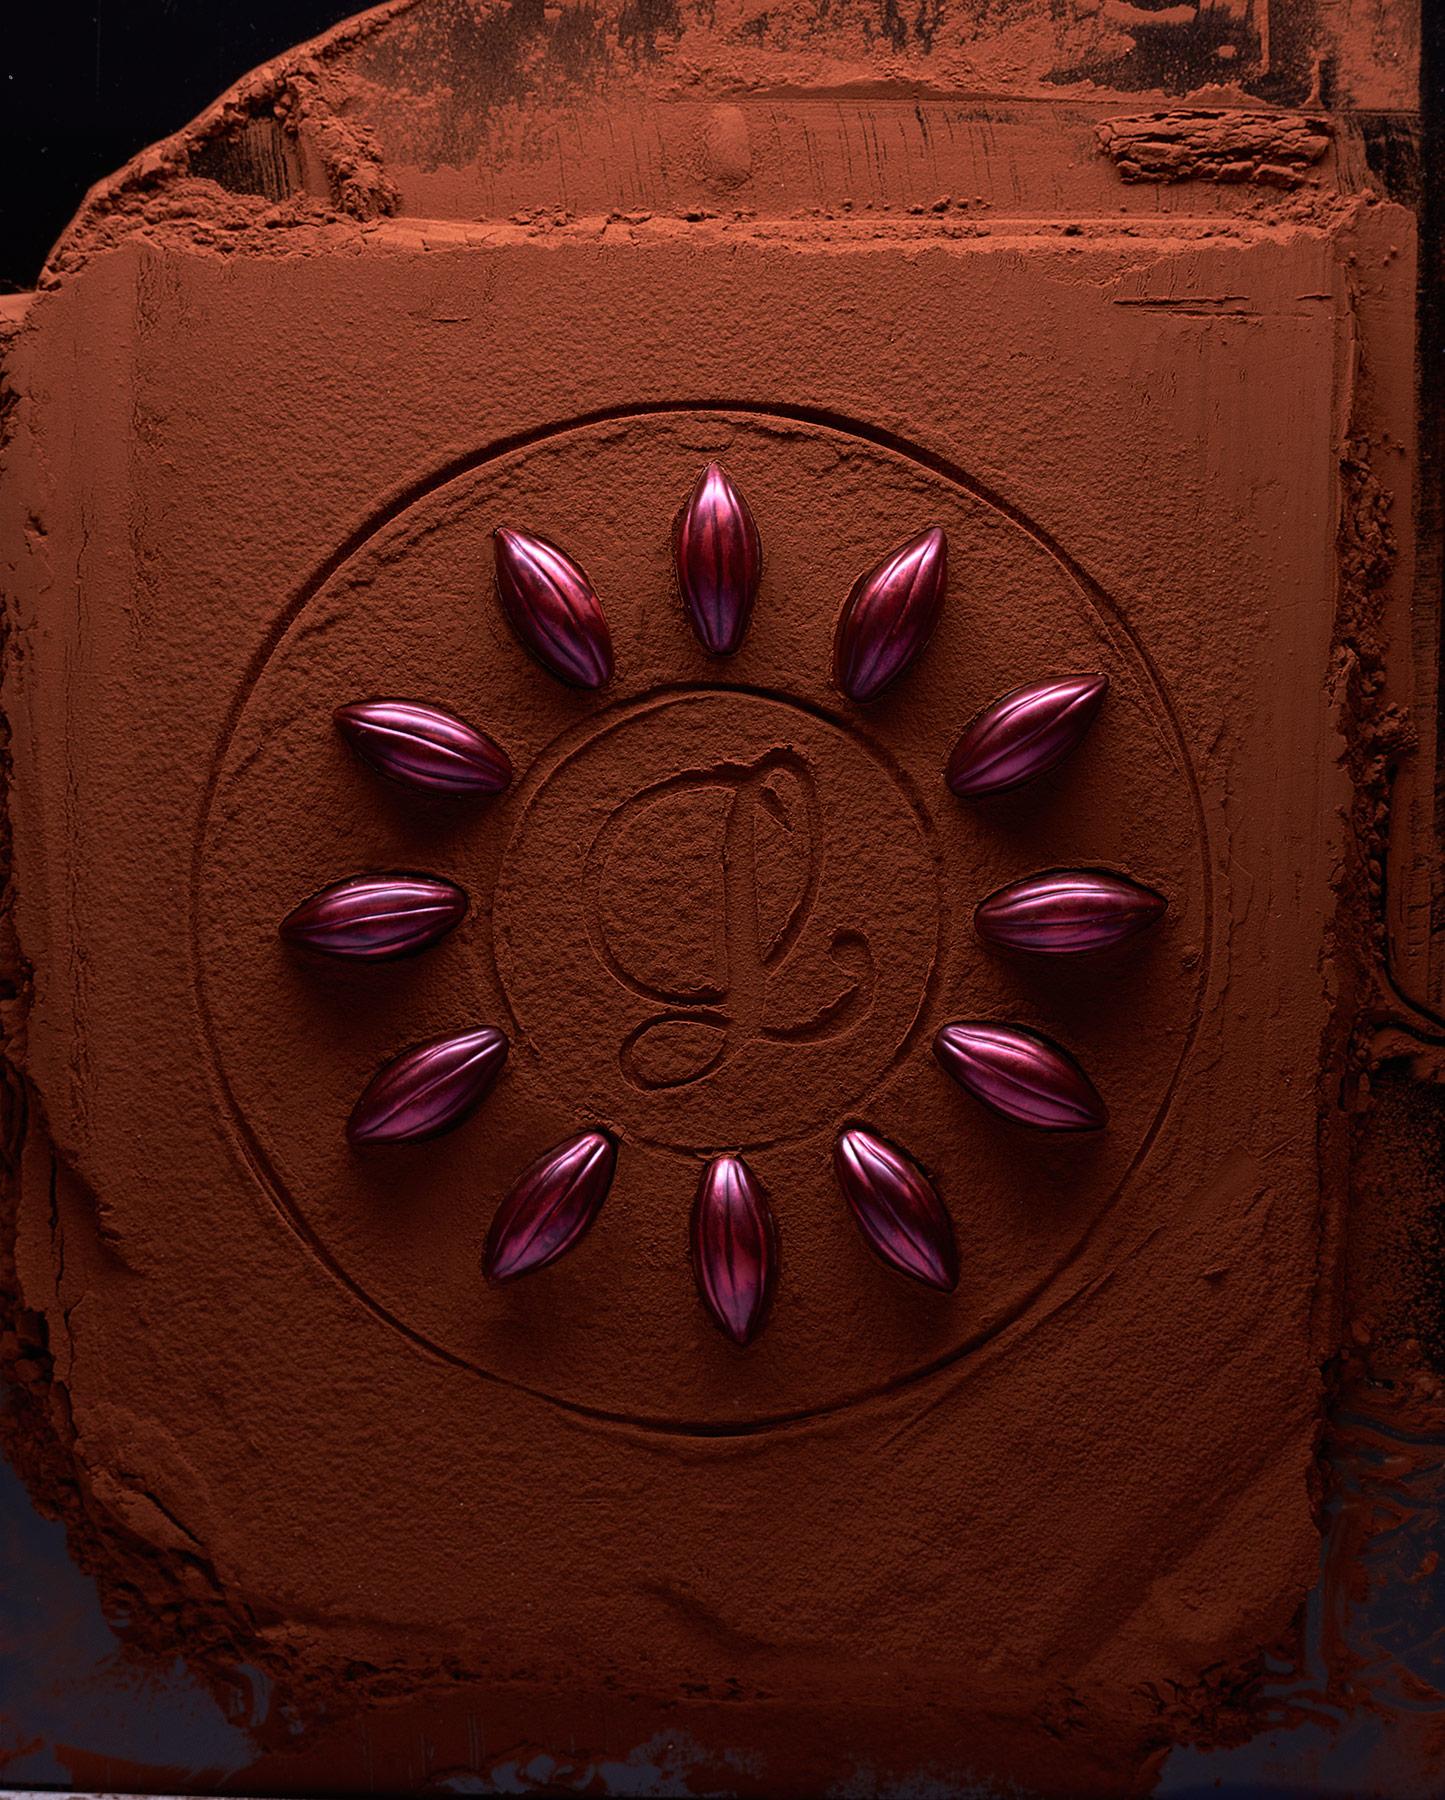 Stillleben Fotografie Lebensmittel Logo Schokolade